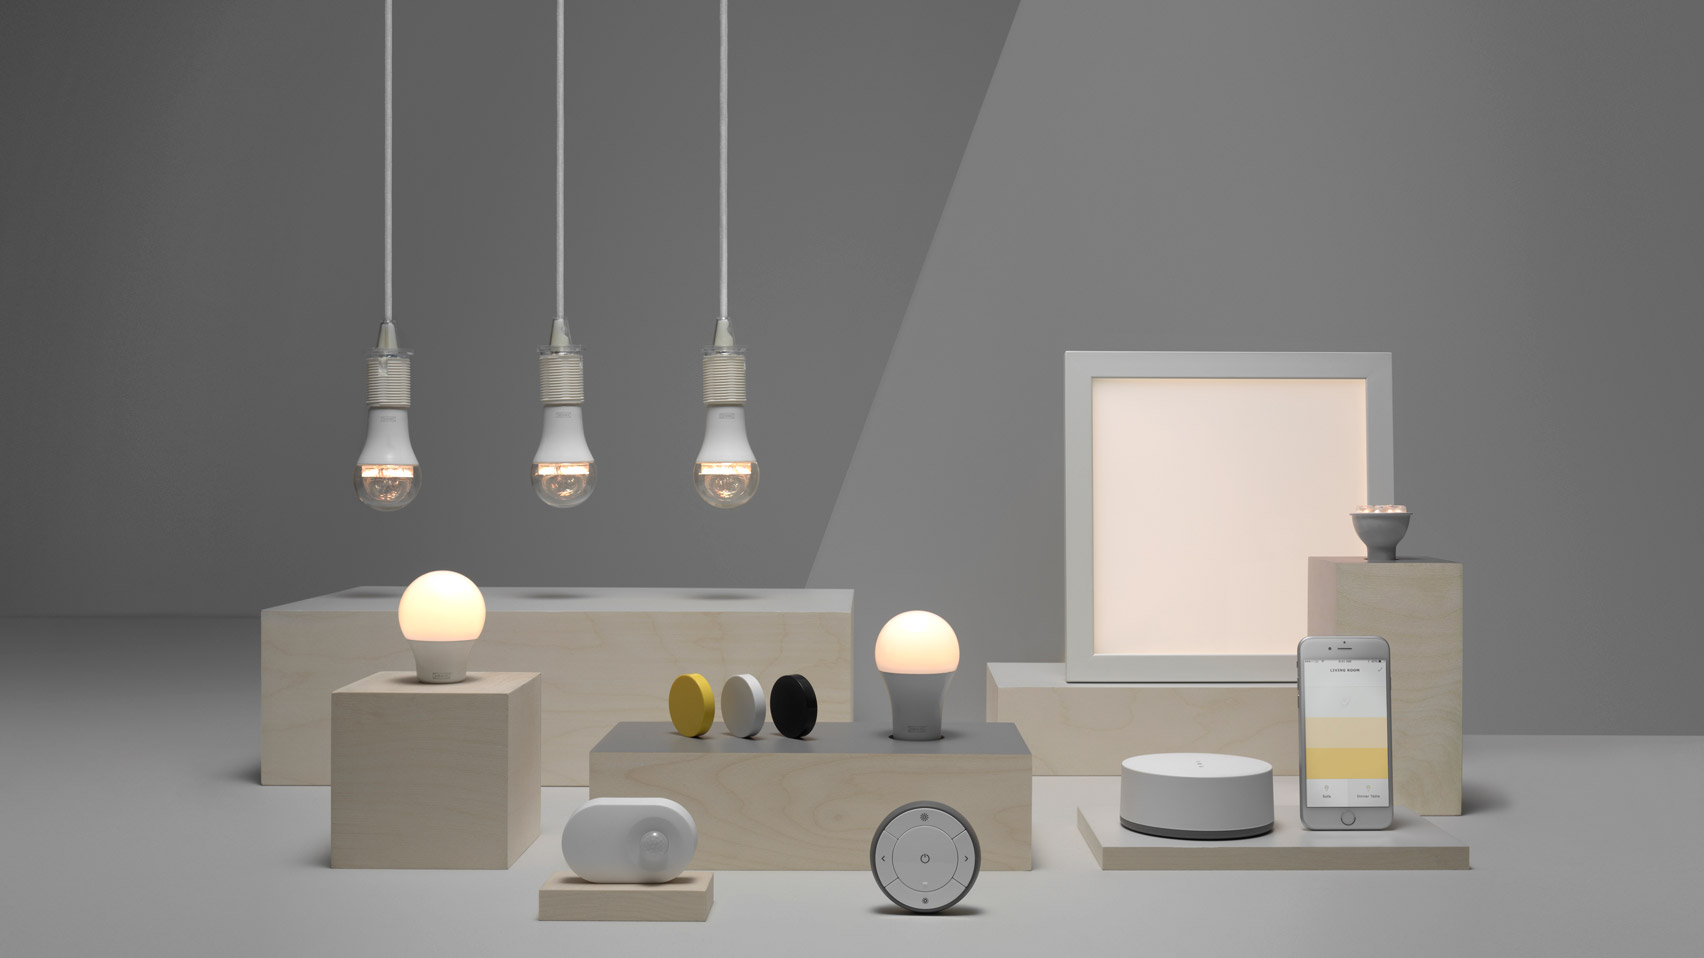 Trådfri lighting range, Connected light bulbs   Ikea - 2017